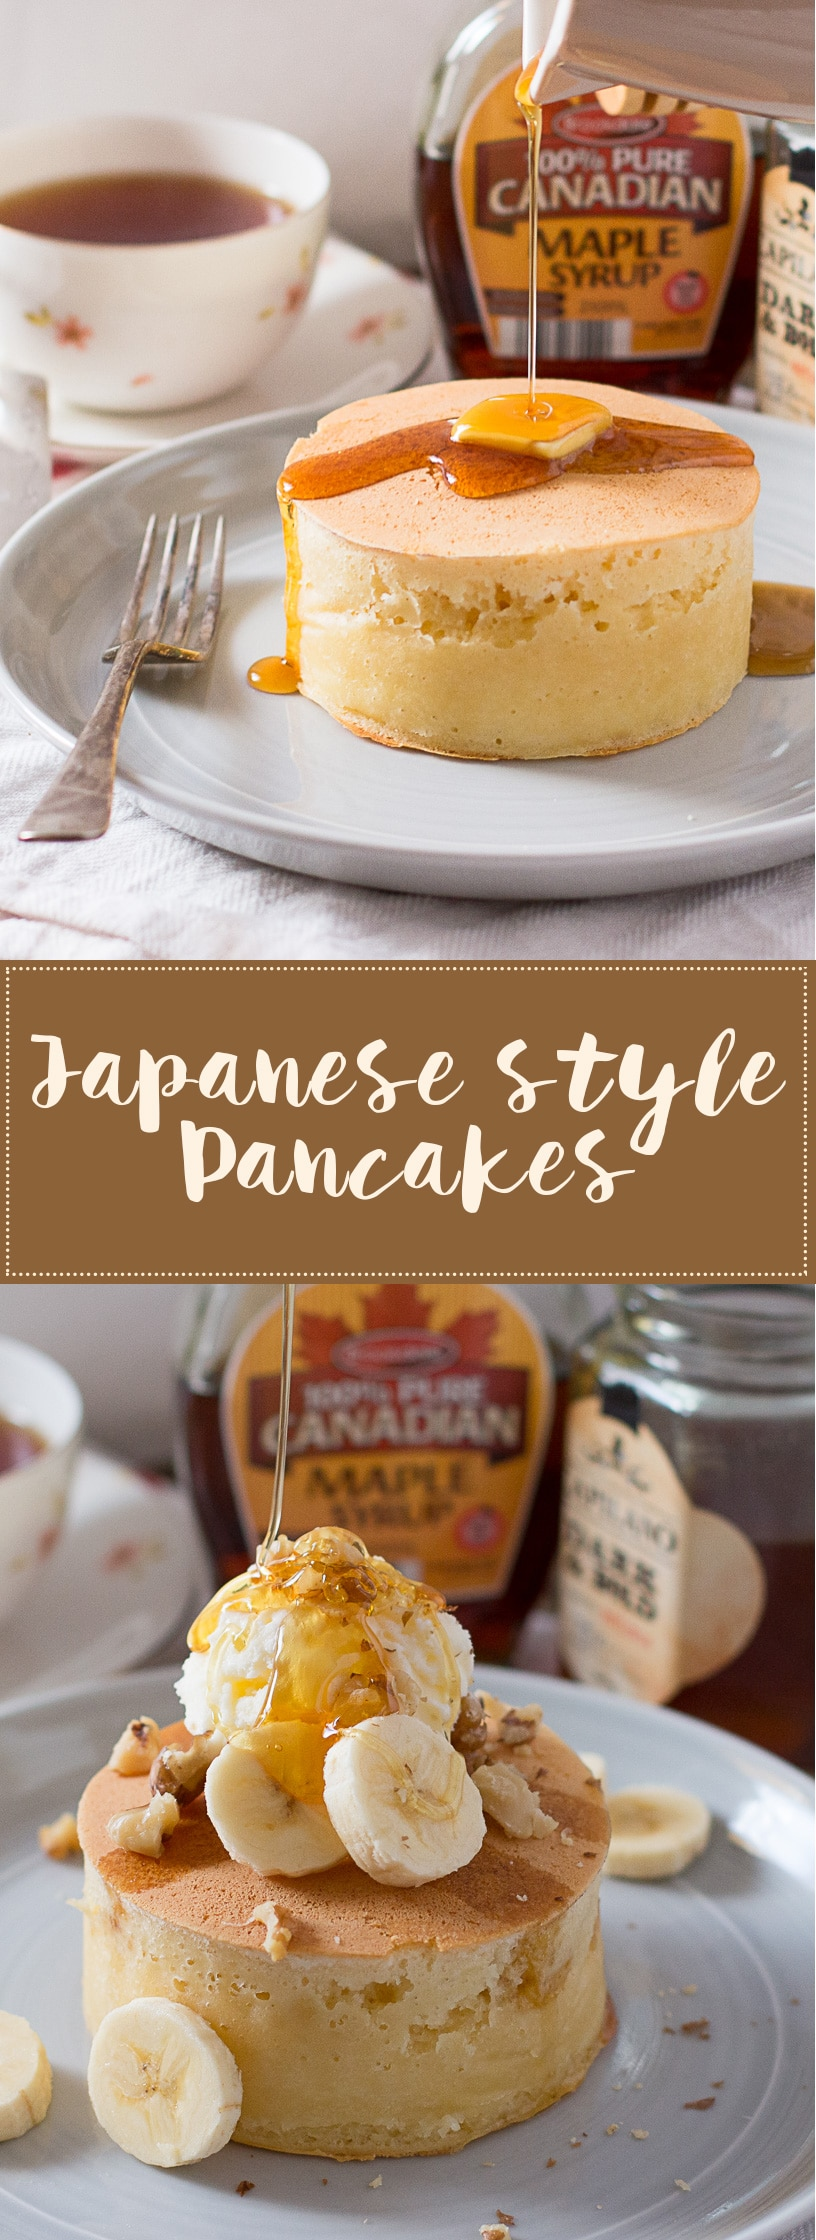 Japanese-style-pancakes-banana-topping-